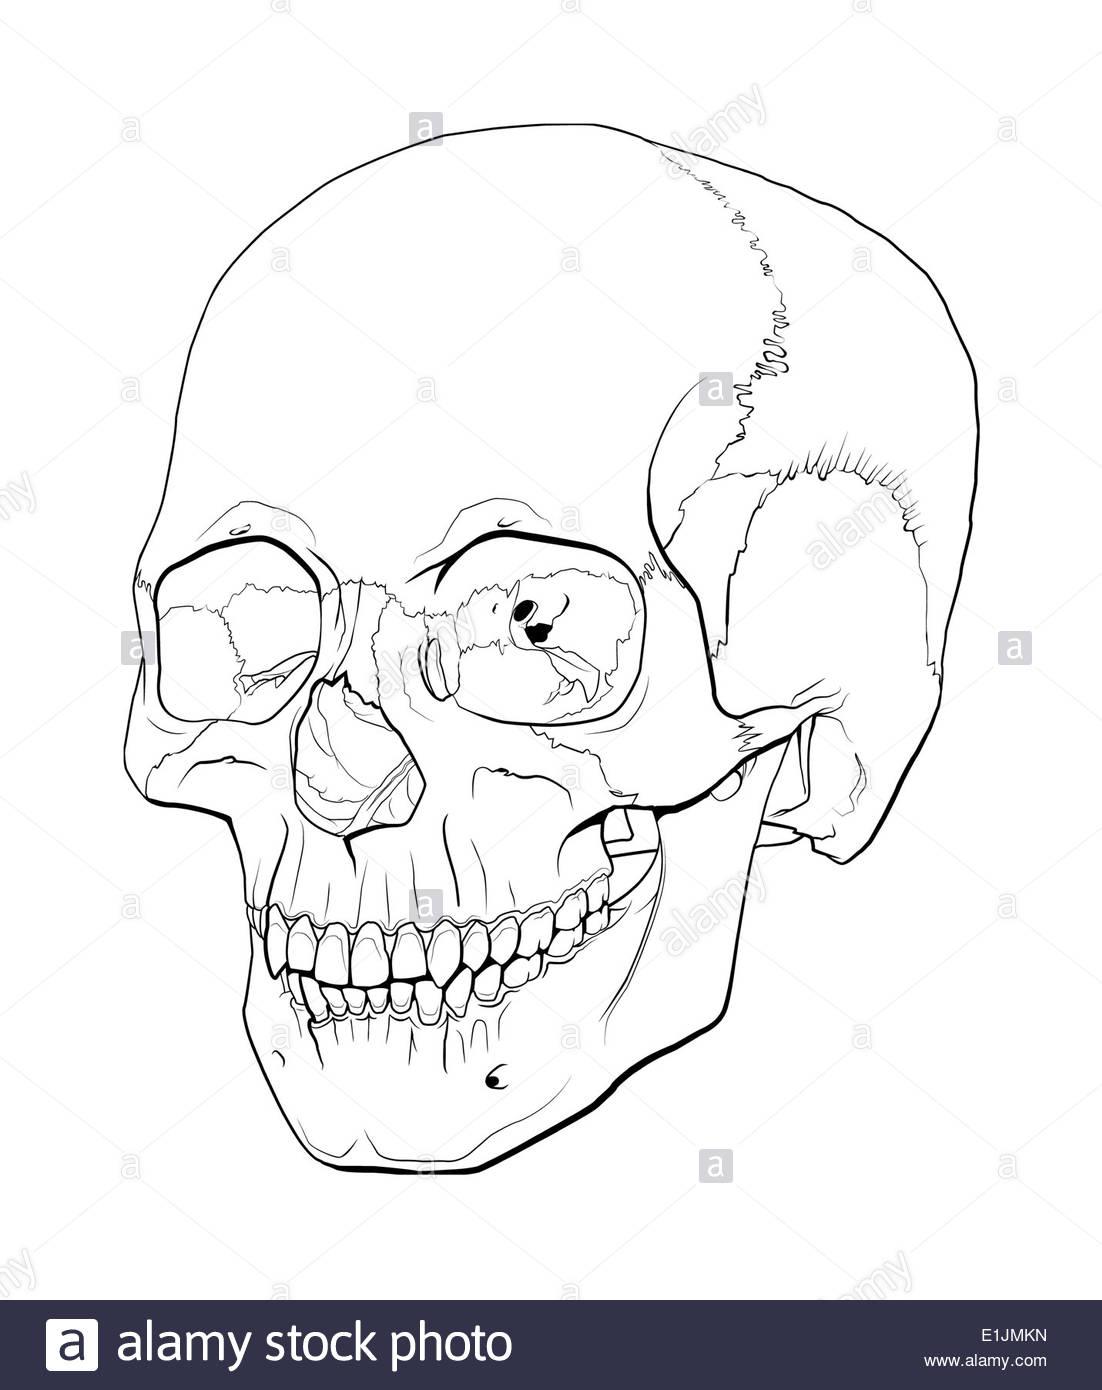 Line illustration of a human skull. - Stock Image